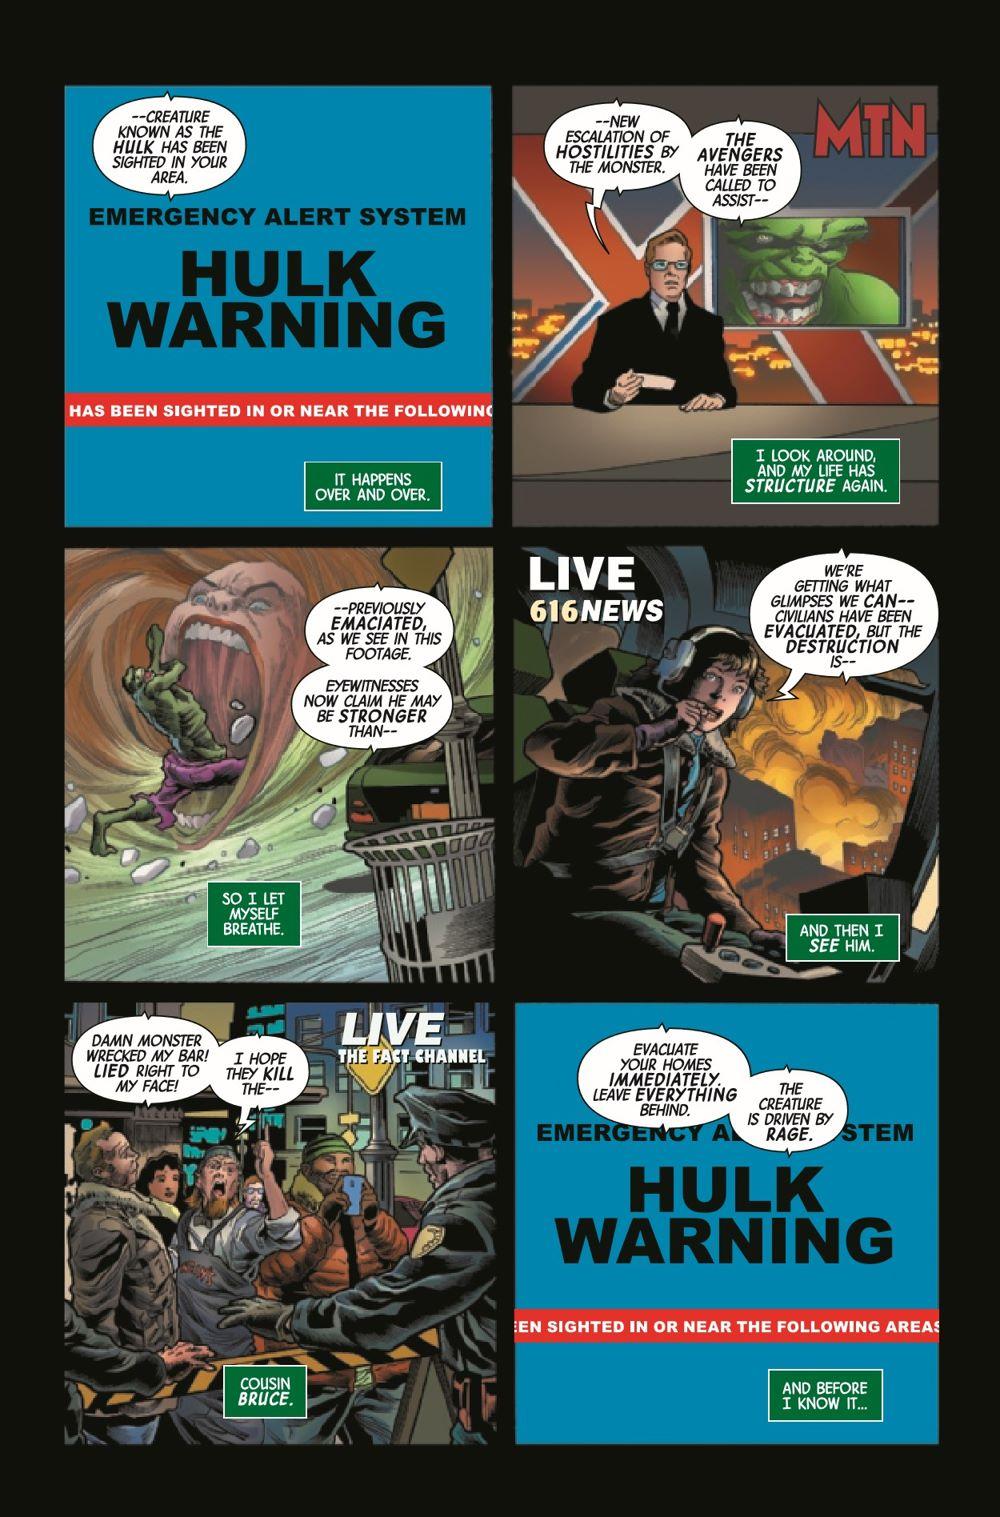 HULK2018047_Preview-2 ComicList Previews: THE IMMORTAL HULK #47